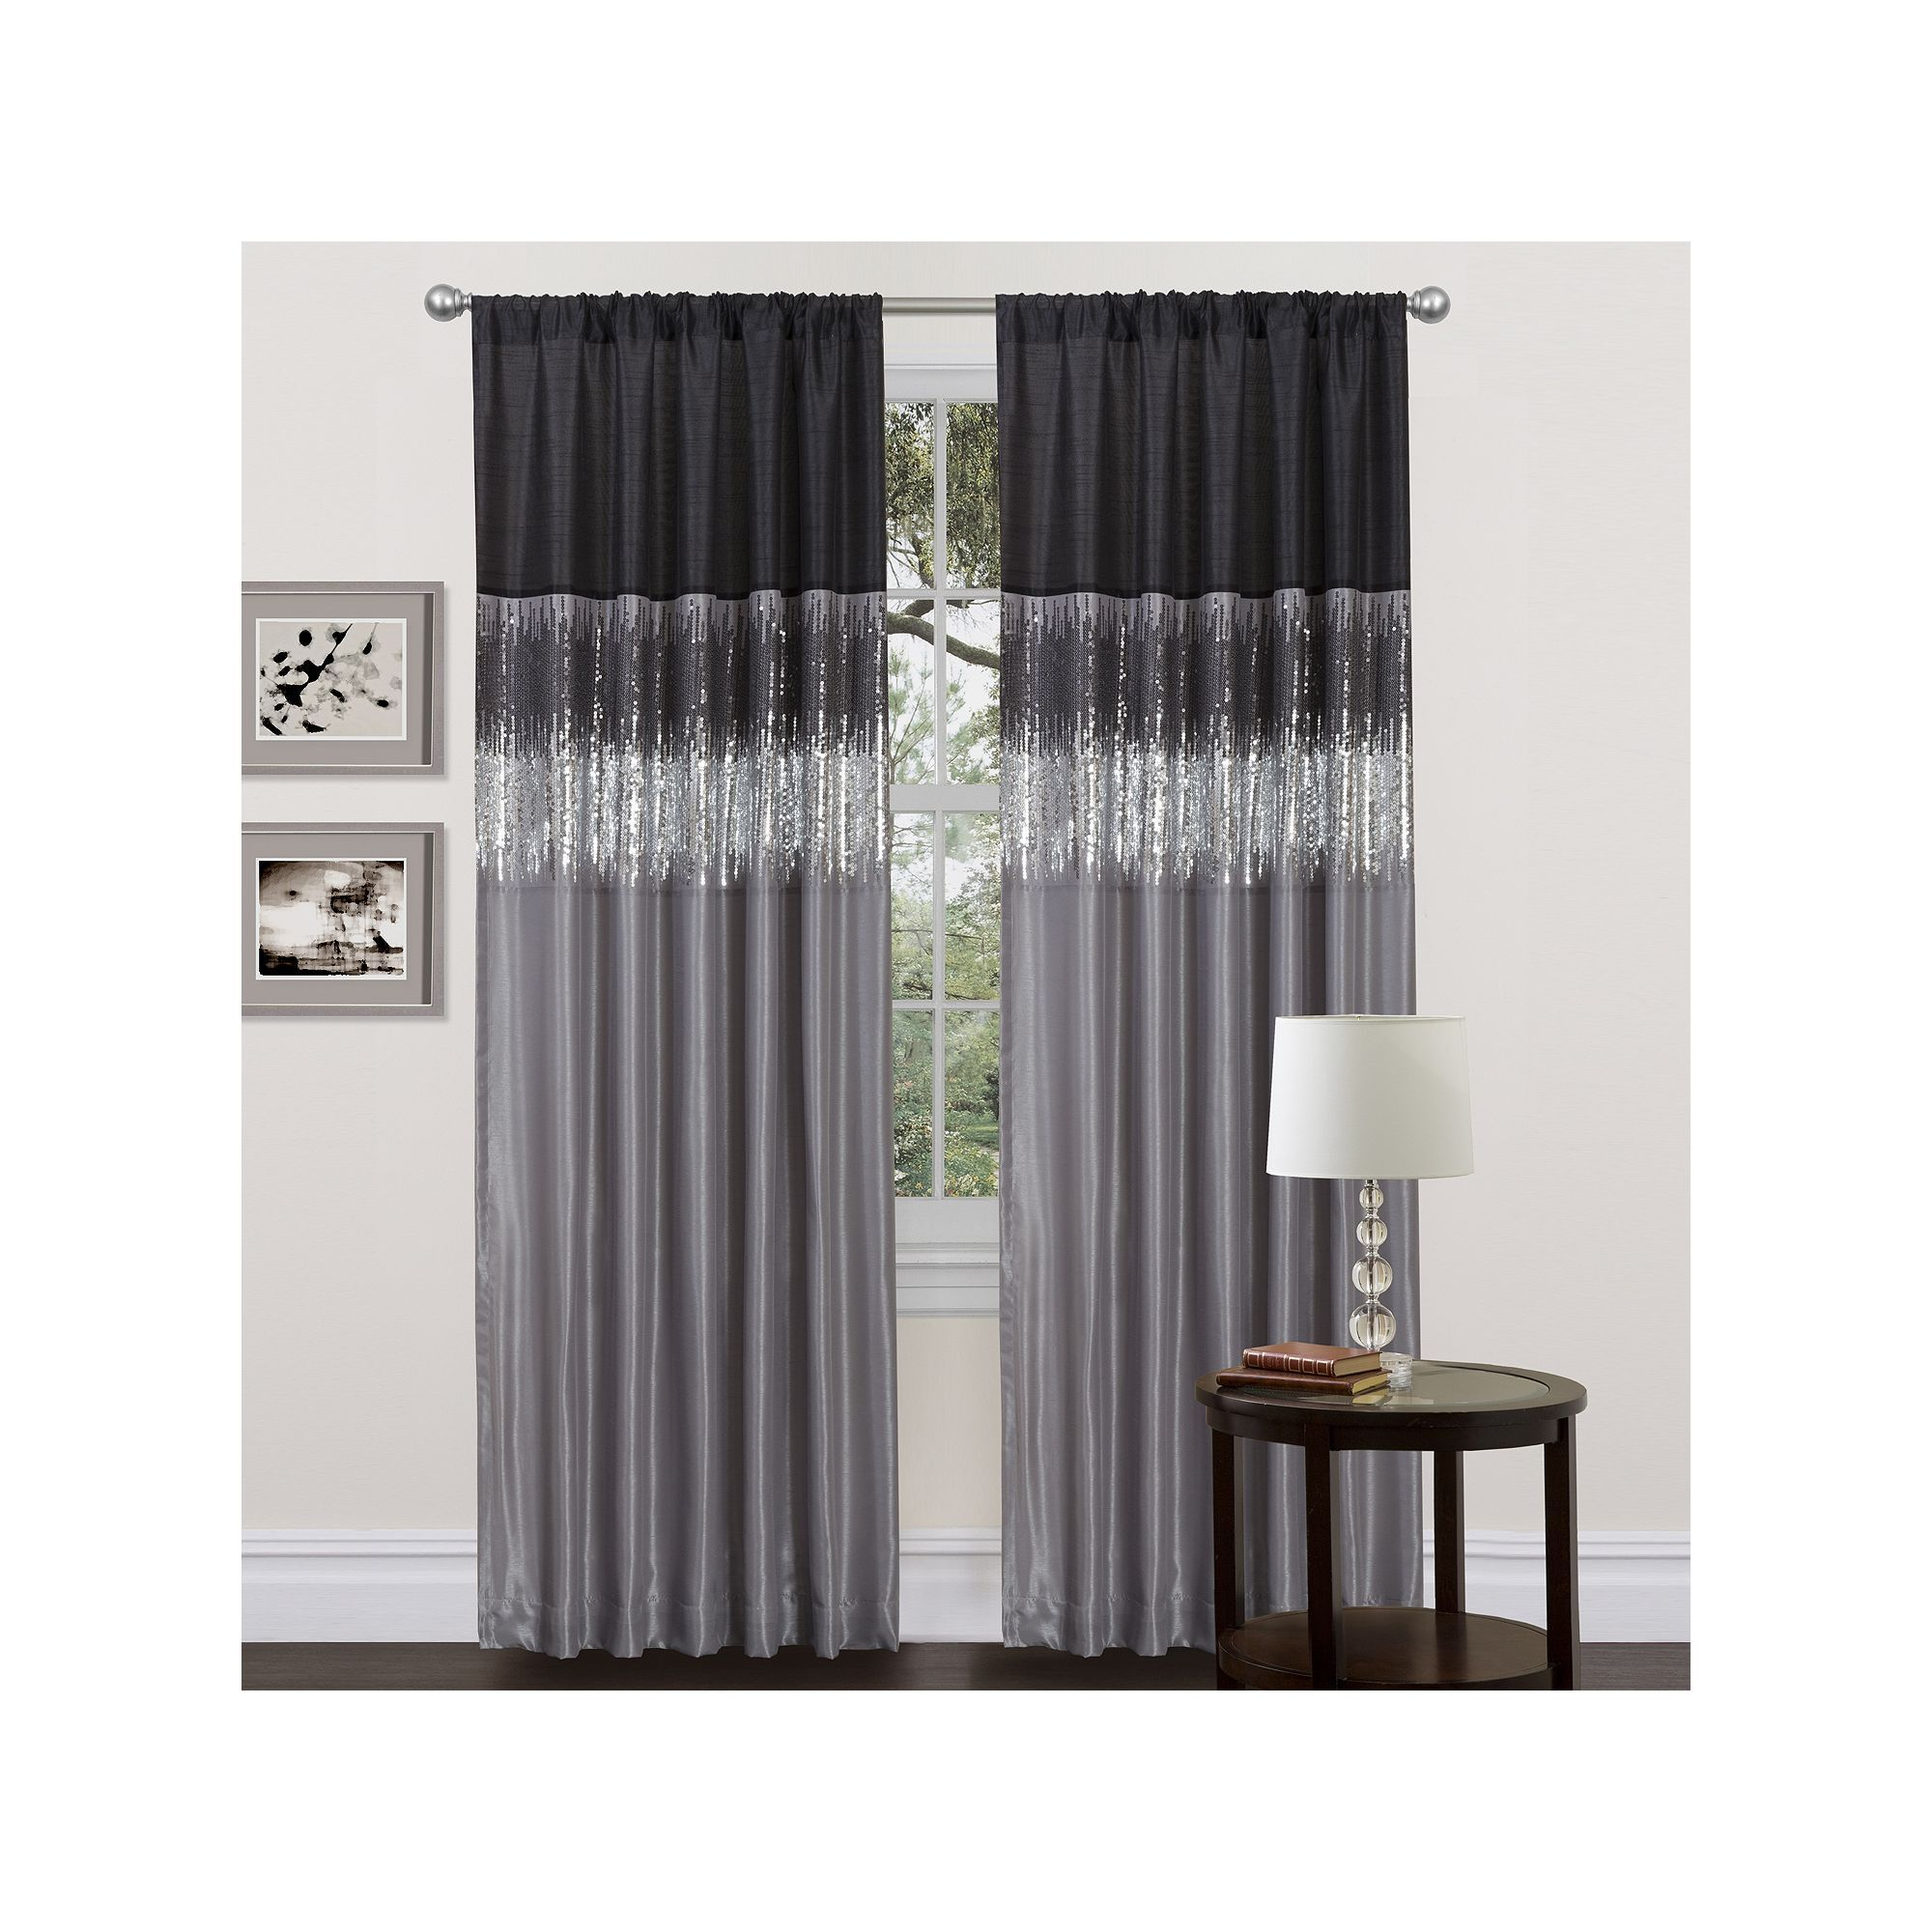 Lush Decor 1 Pack Night Sky Window Curtain In 2020 Black Curtains Panel Curtains Drapes Curtains